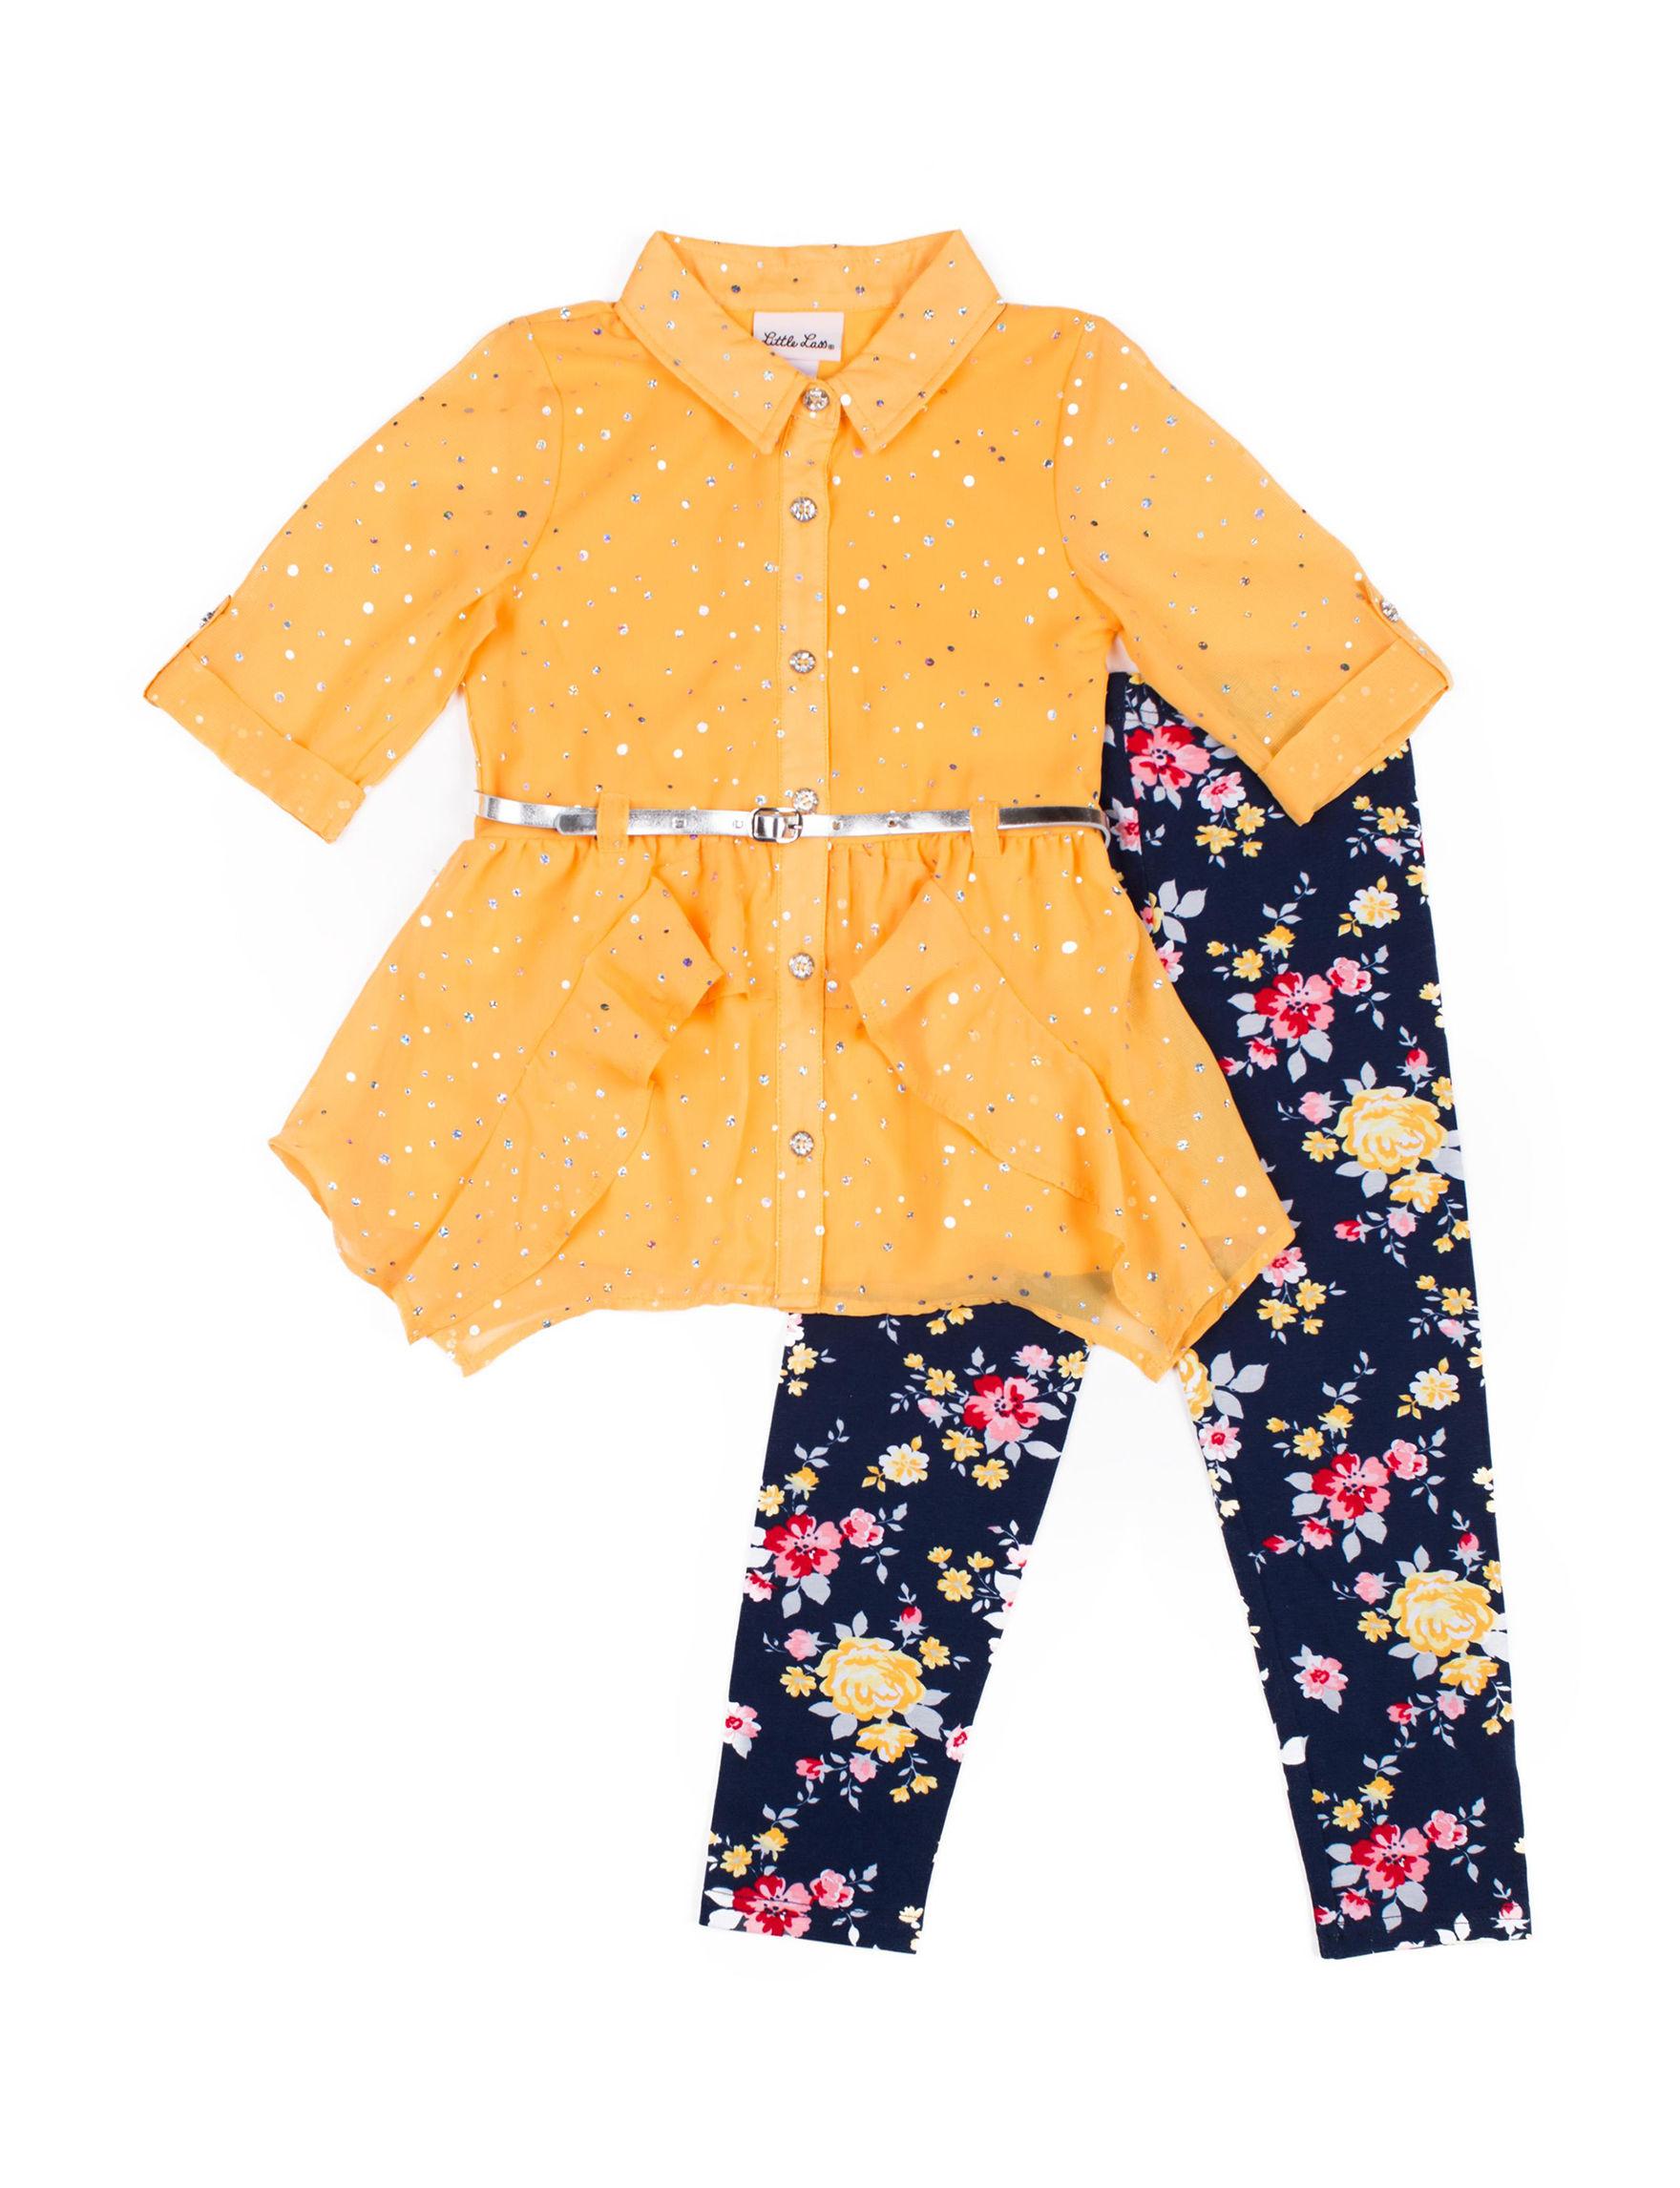 Little Lass Yellow Floral